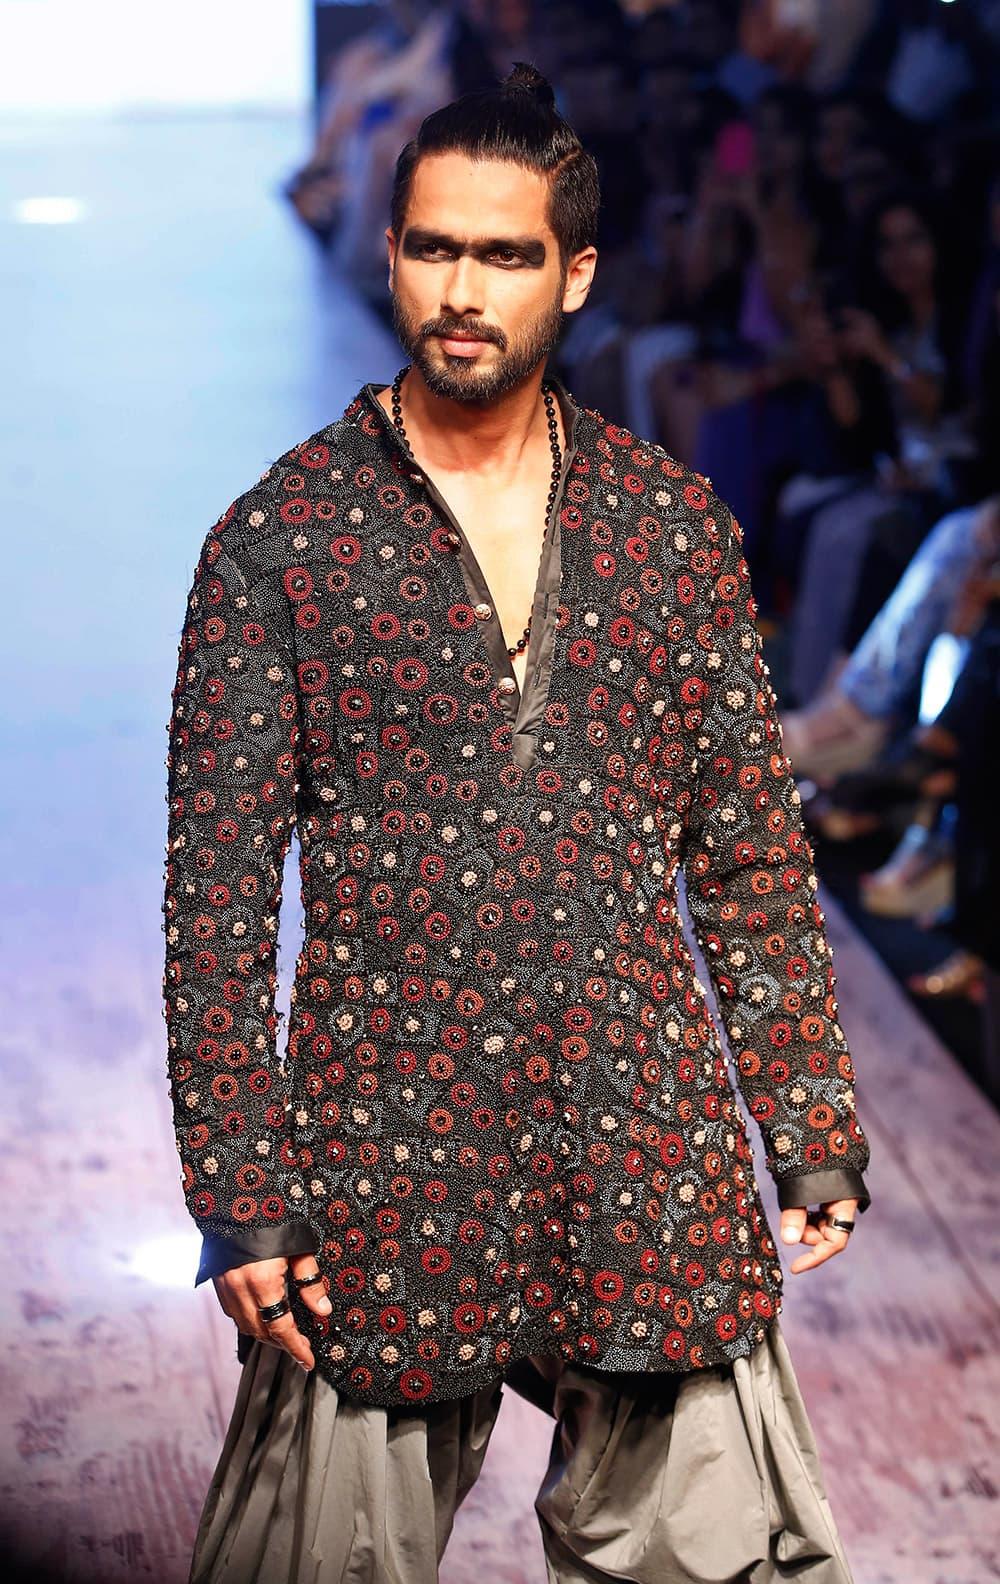 Shahid Kapoor walks the ramp showcasing a Kunal Rawal creation during the Lakme Fashion Week Summer Resort 2015 in Mumbai.